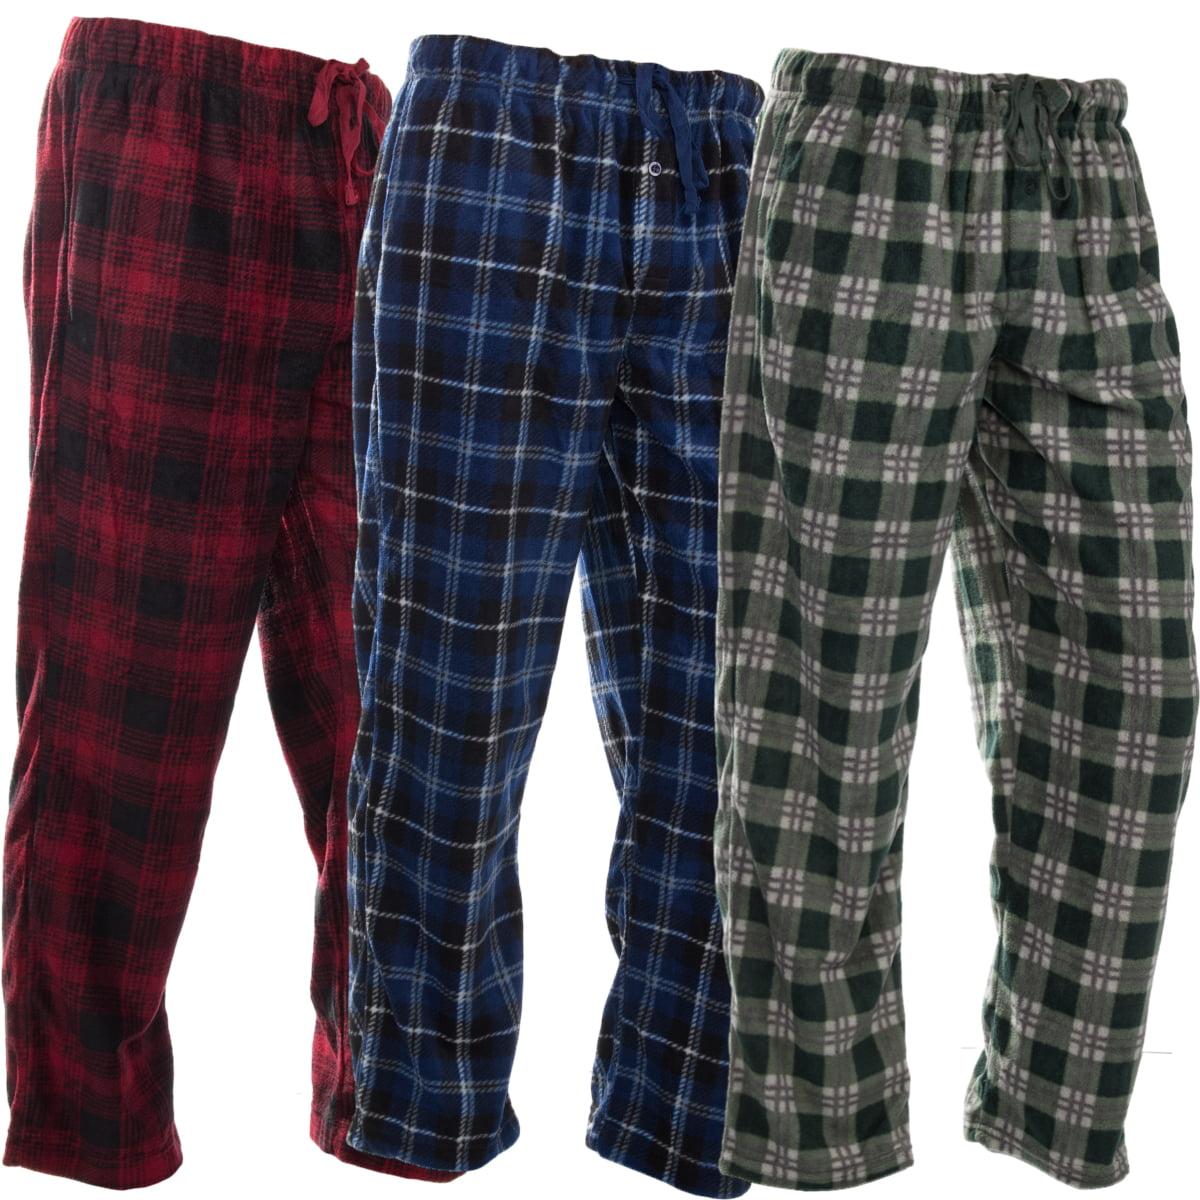 50ab57b363 DG Hill - DG Hill (3 Pairs) Mens PJ Pajama Pants Bottoms Fleece Lounge  Pants Sleepwear Plaid PJs with Pockets Microfleece - Walmart.com